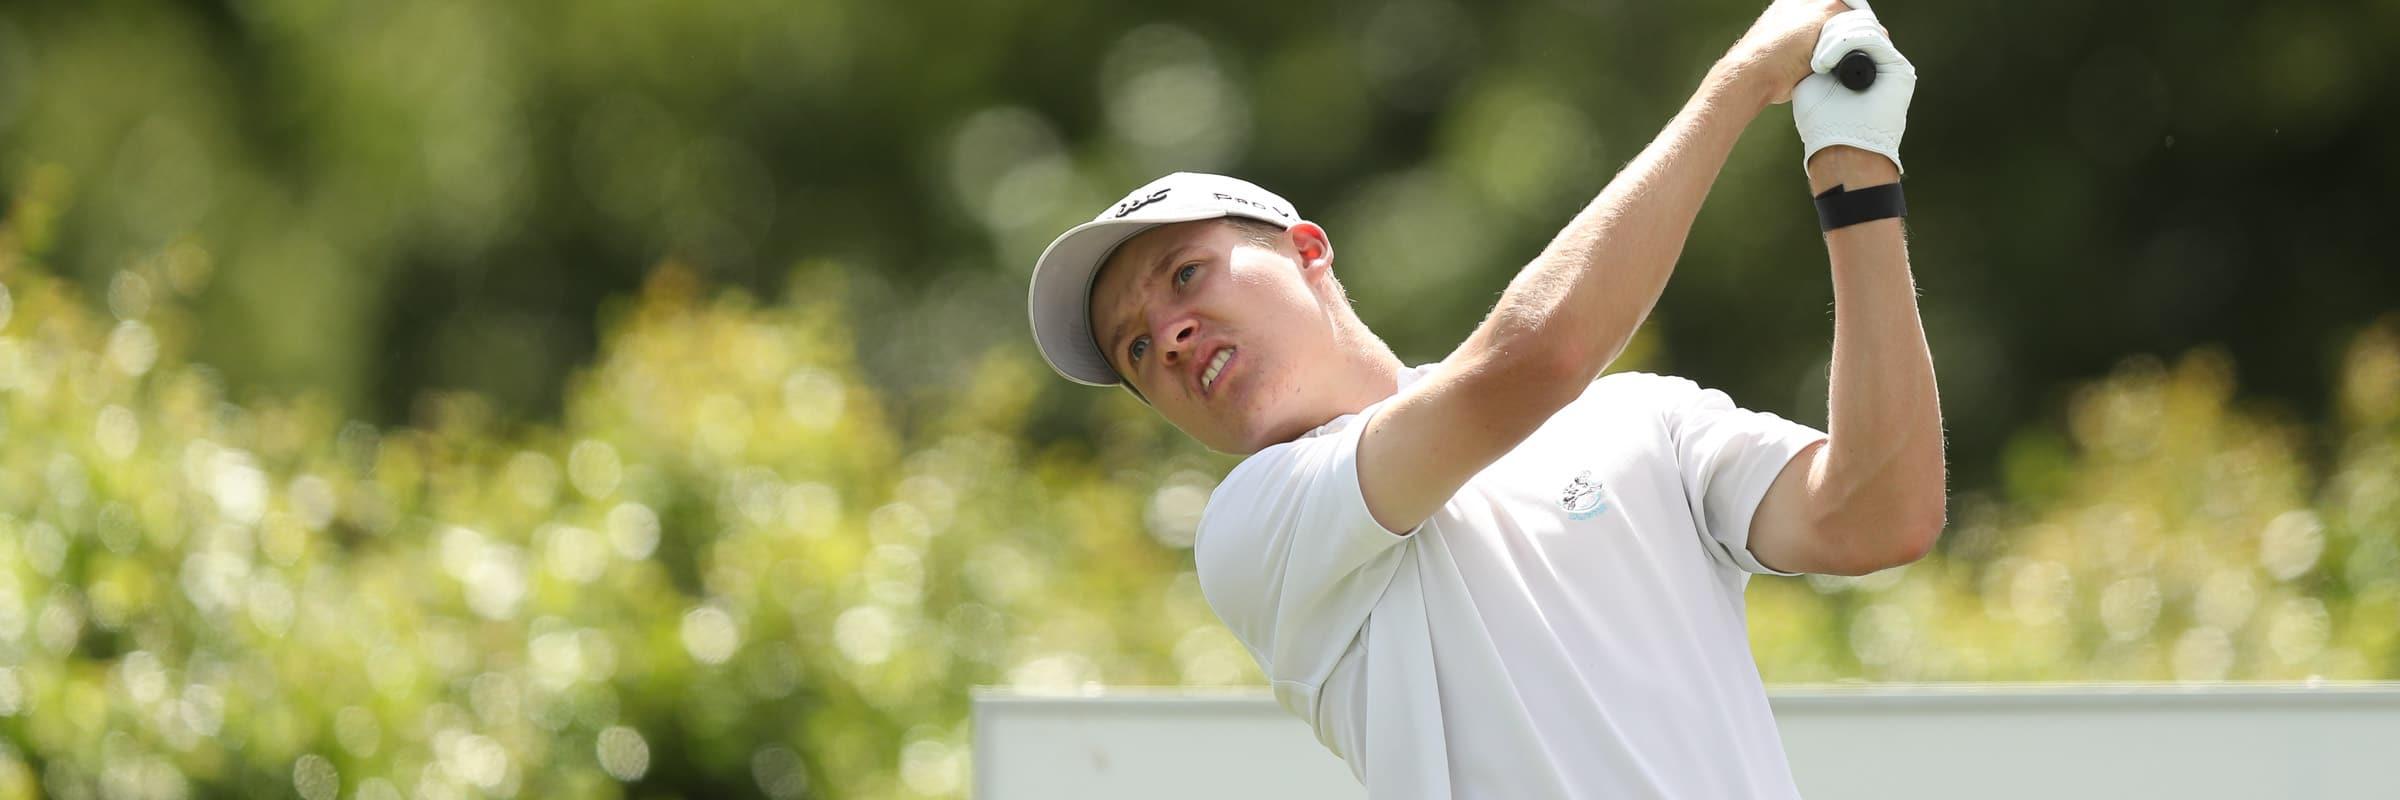 2022 NSW Open Regional Amateur Qualifying - NSW Open Golf ...